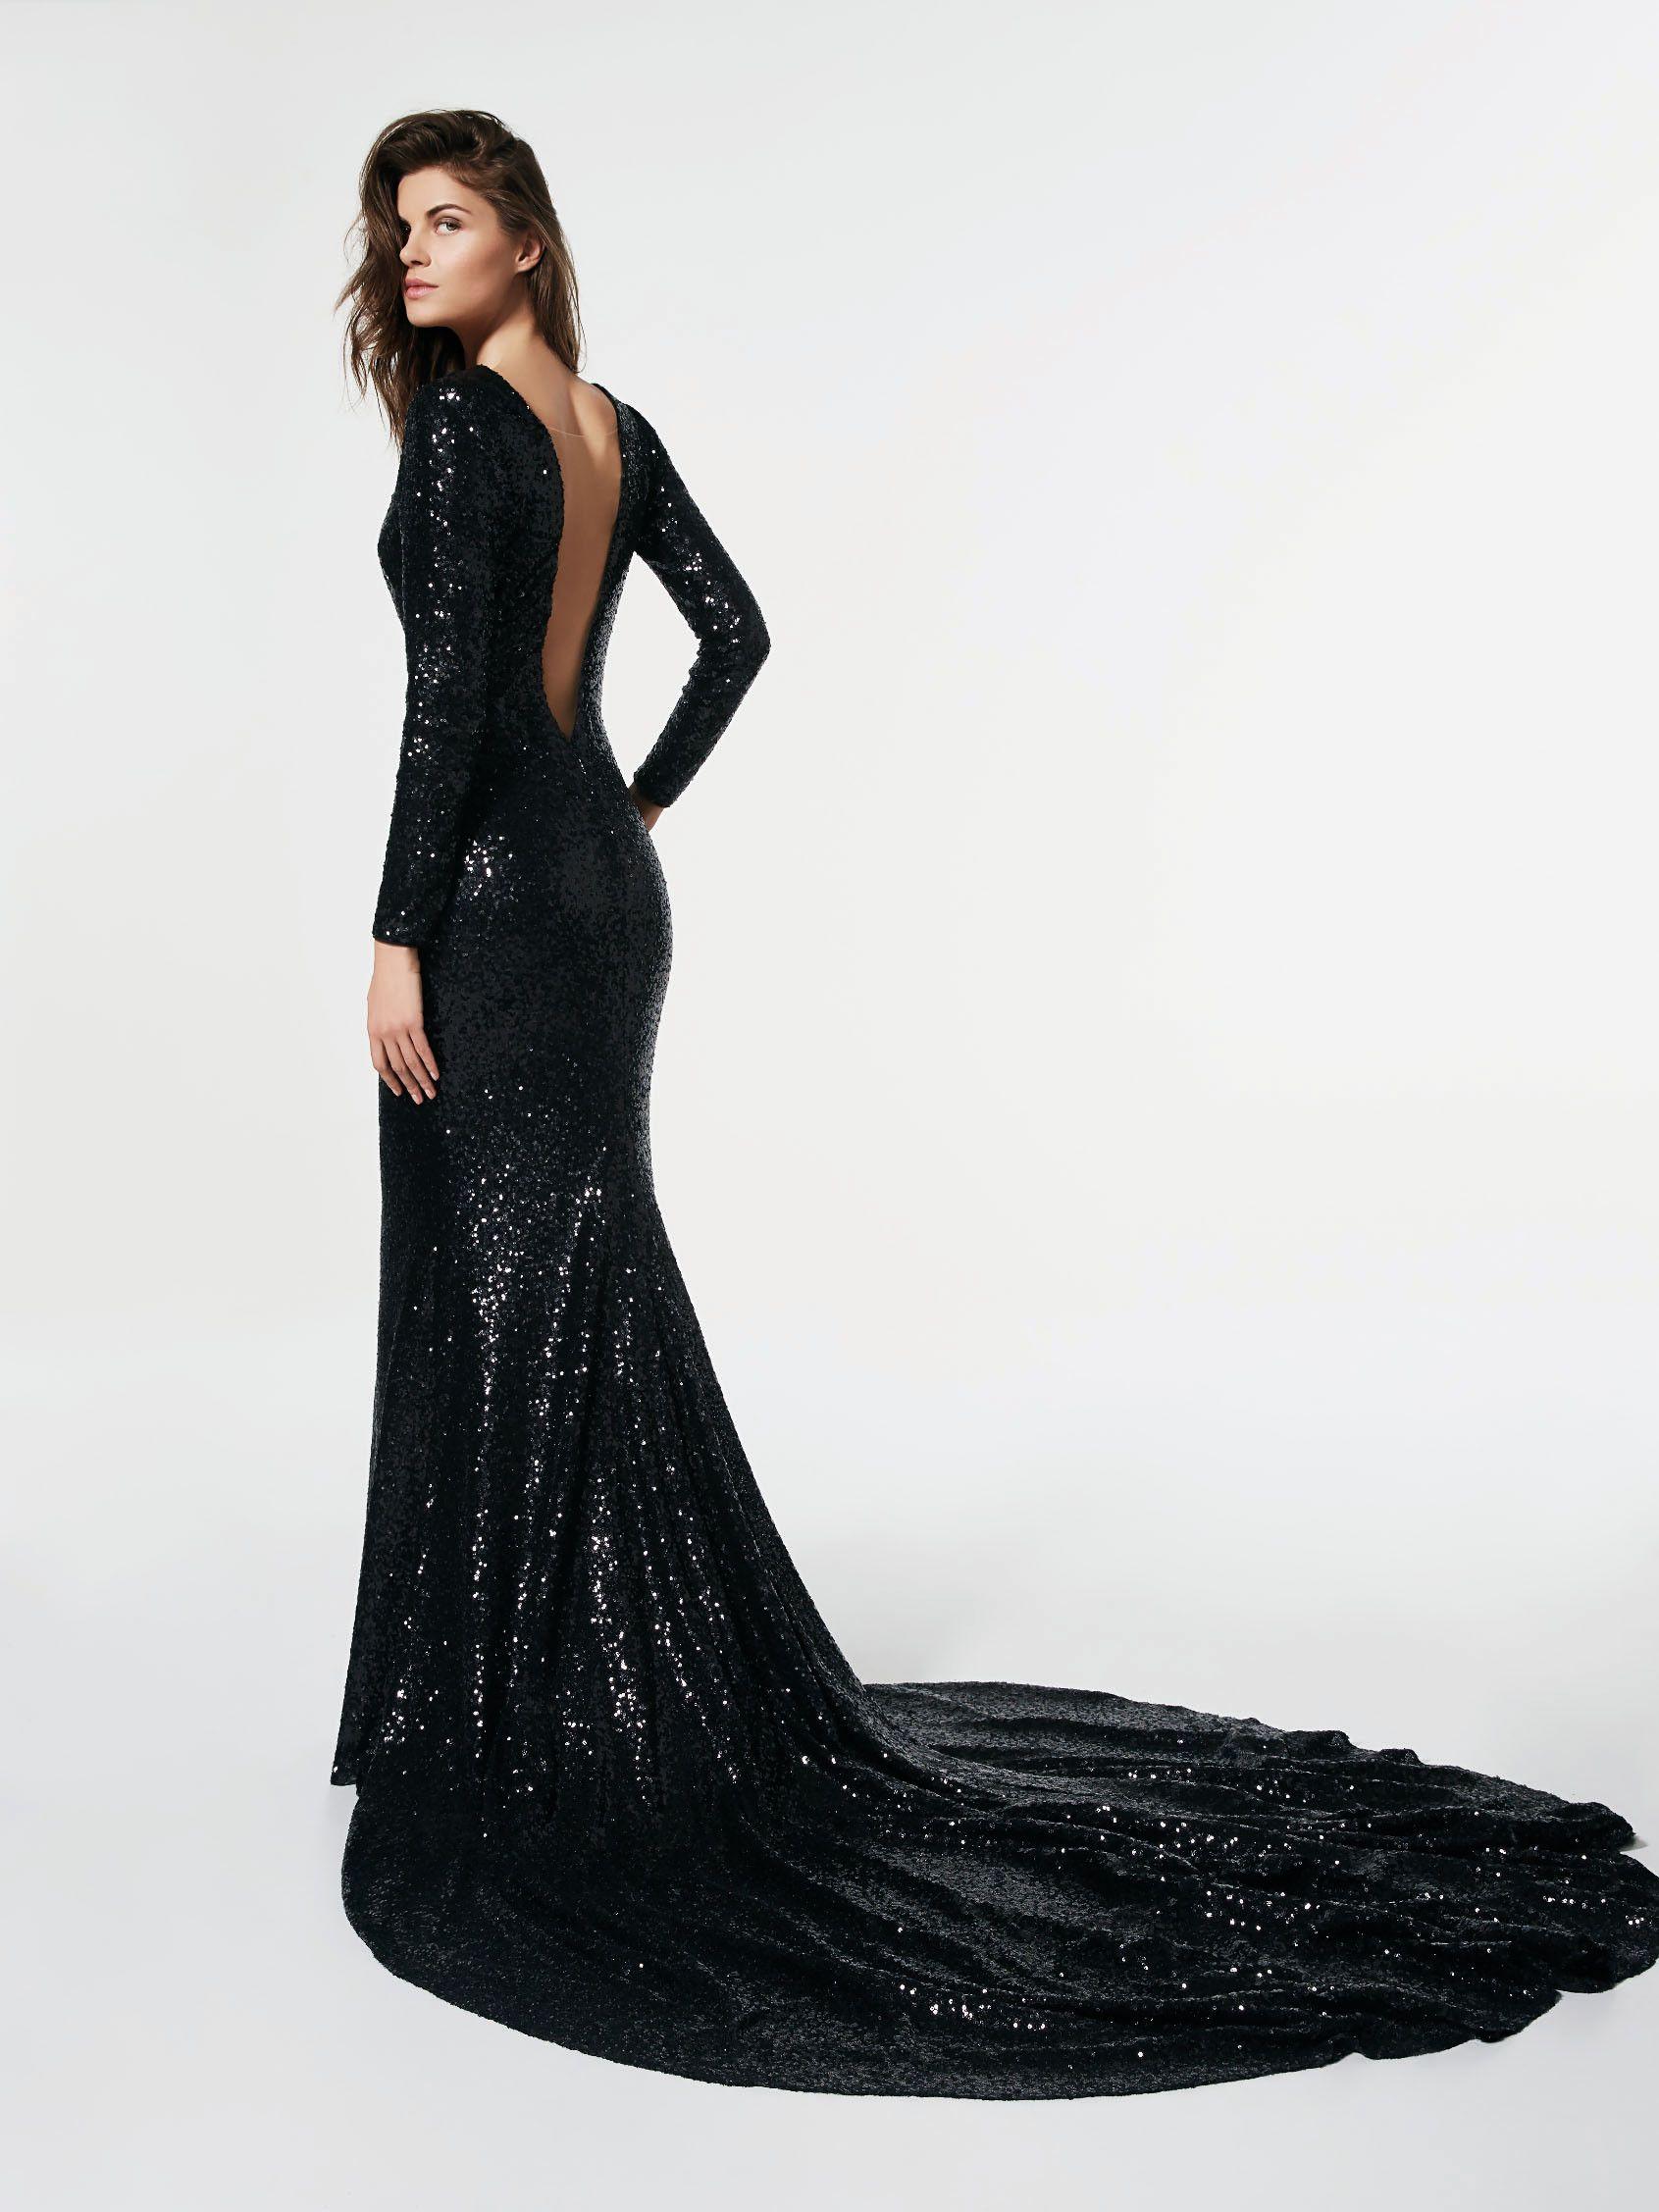 cecd23557c Imagen del vestido de fiesta negro (62085). Vestido GLASGOW largo manga  larga